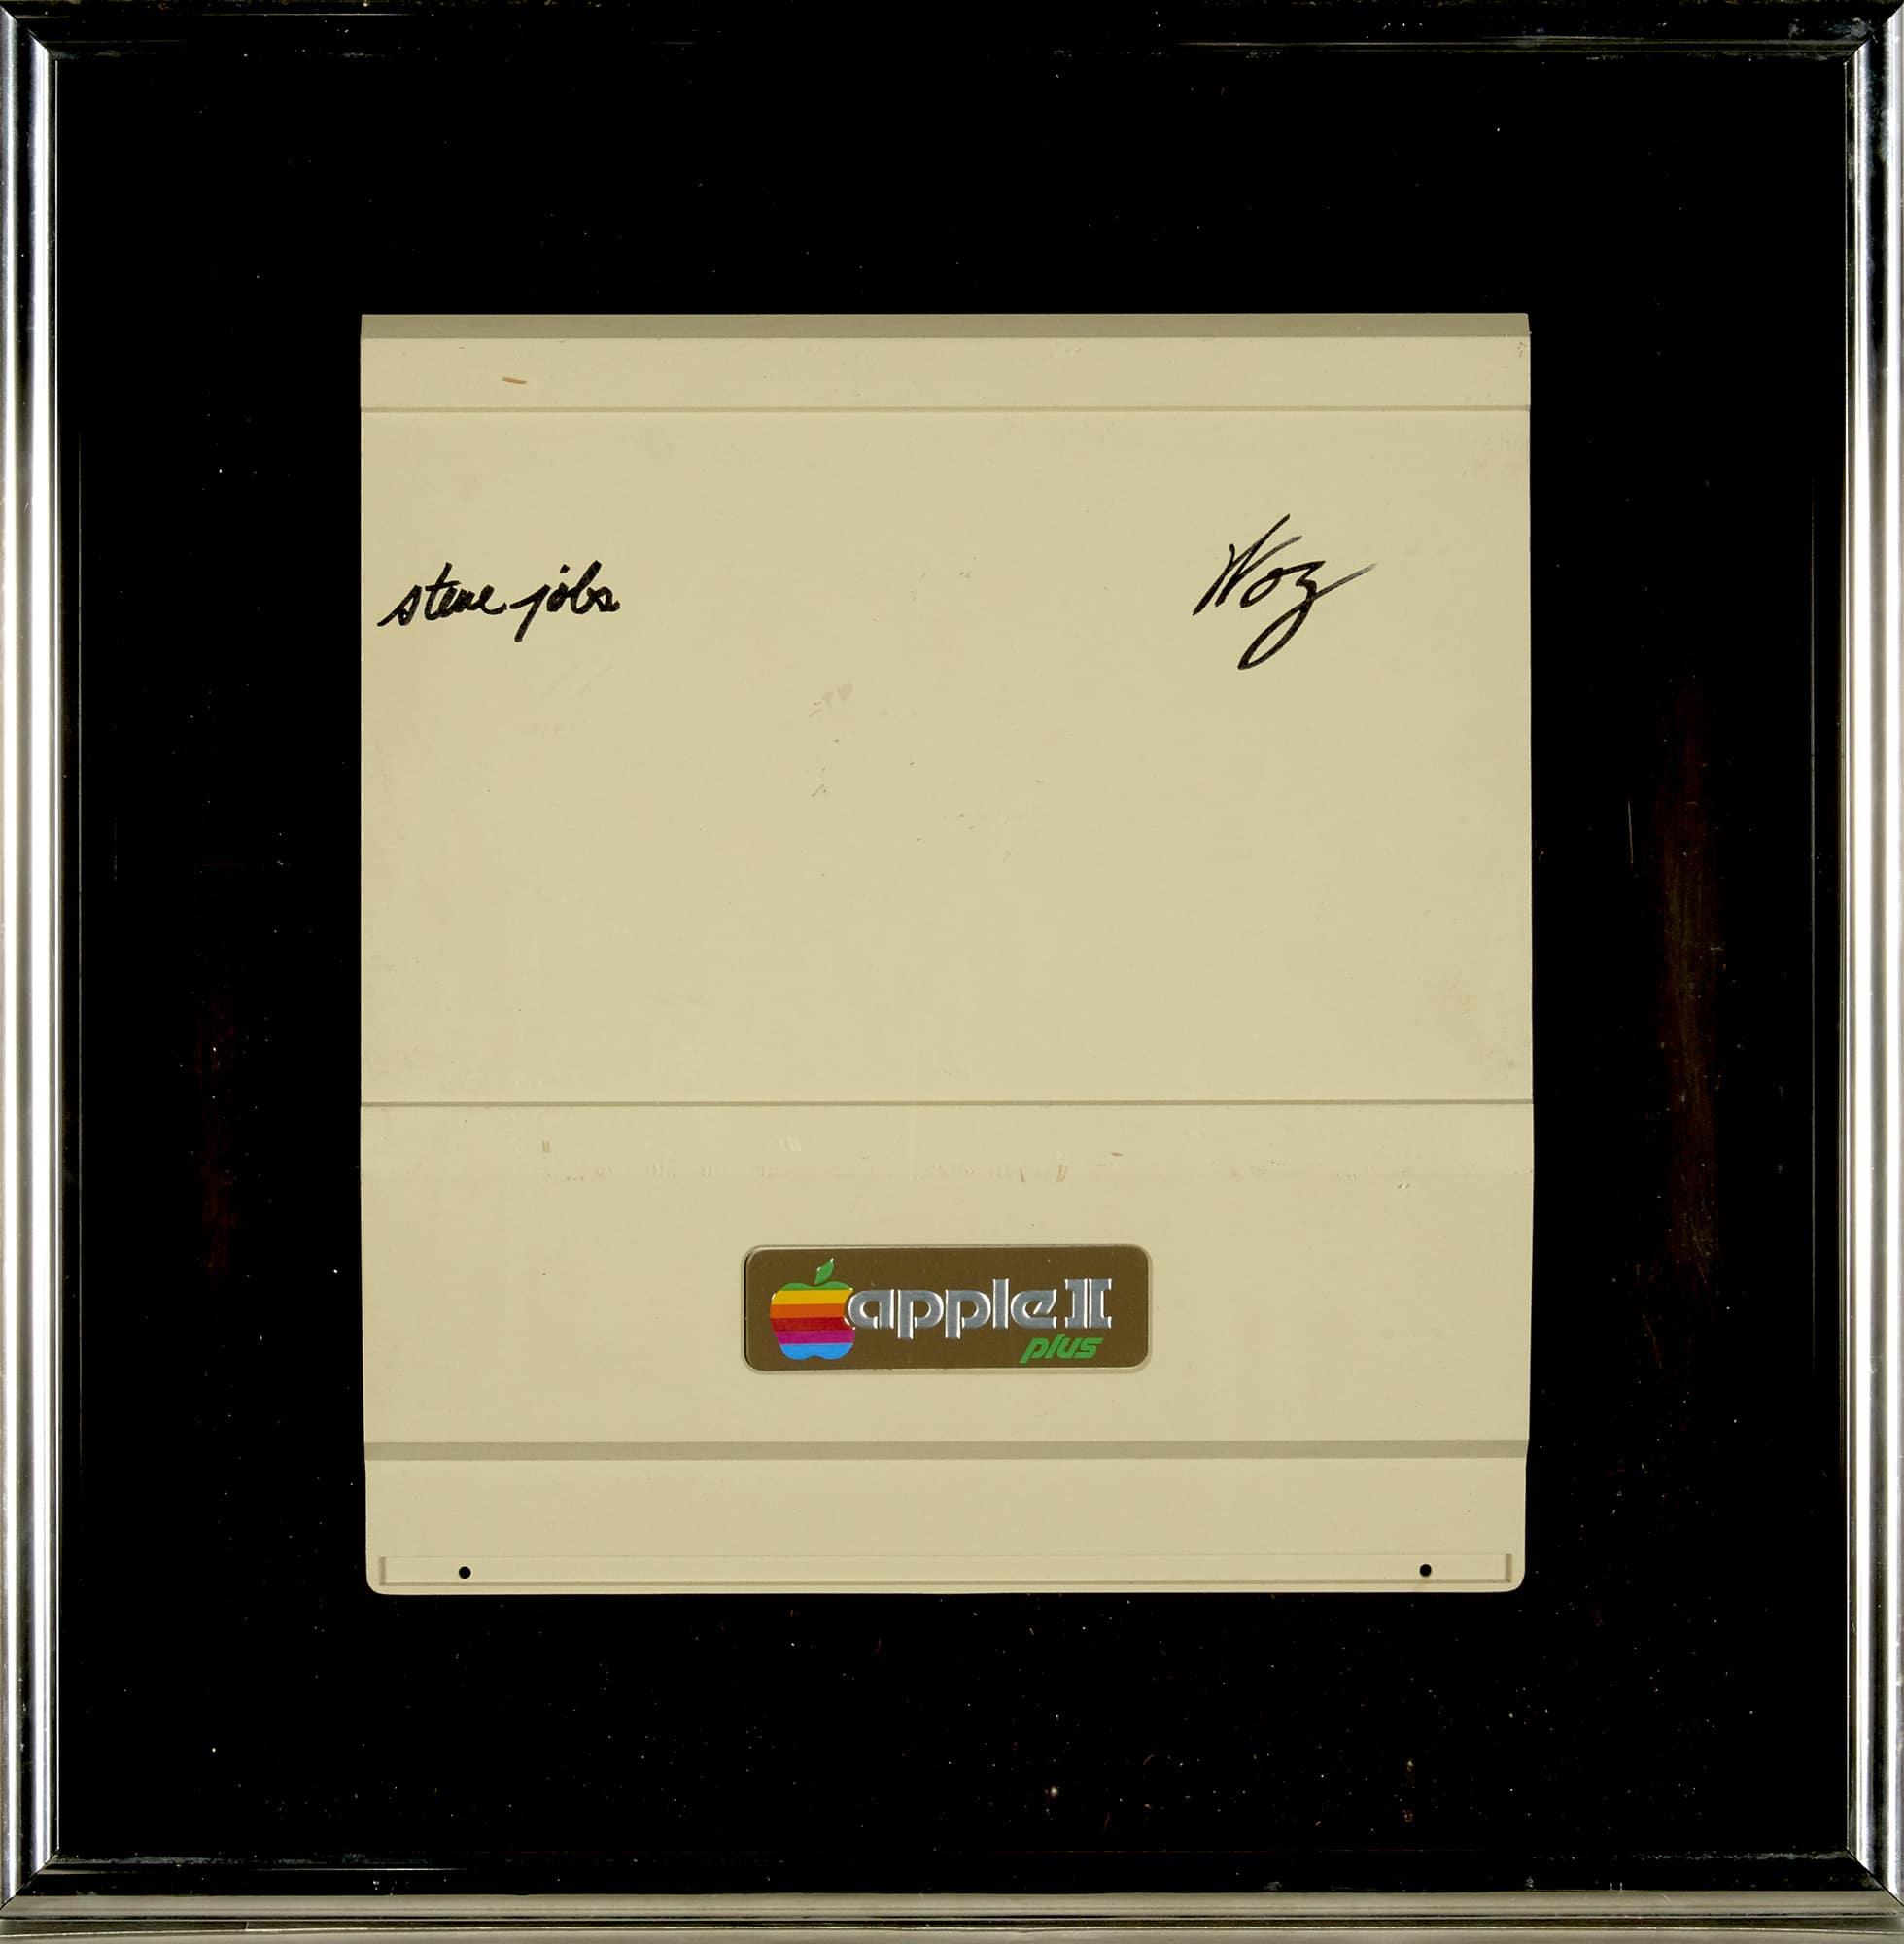 Tampa assinada do Apple II Plus